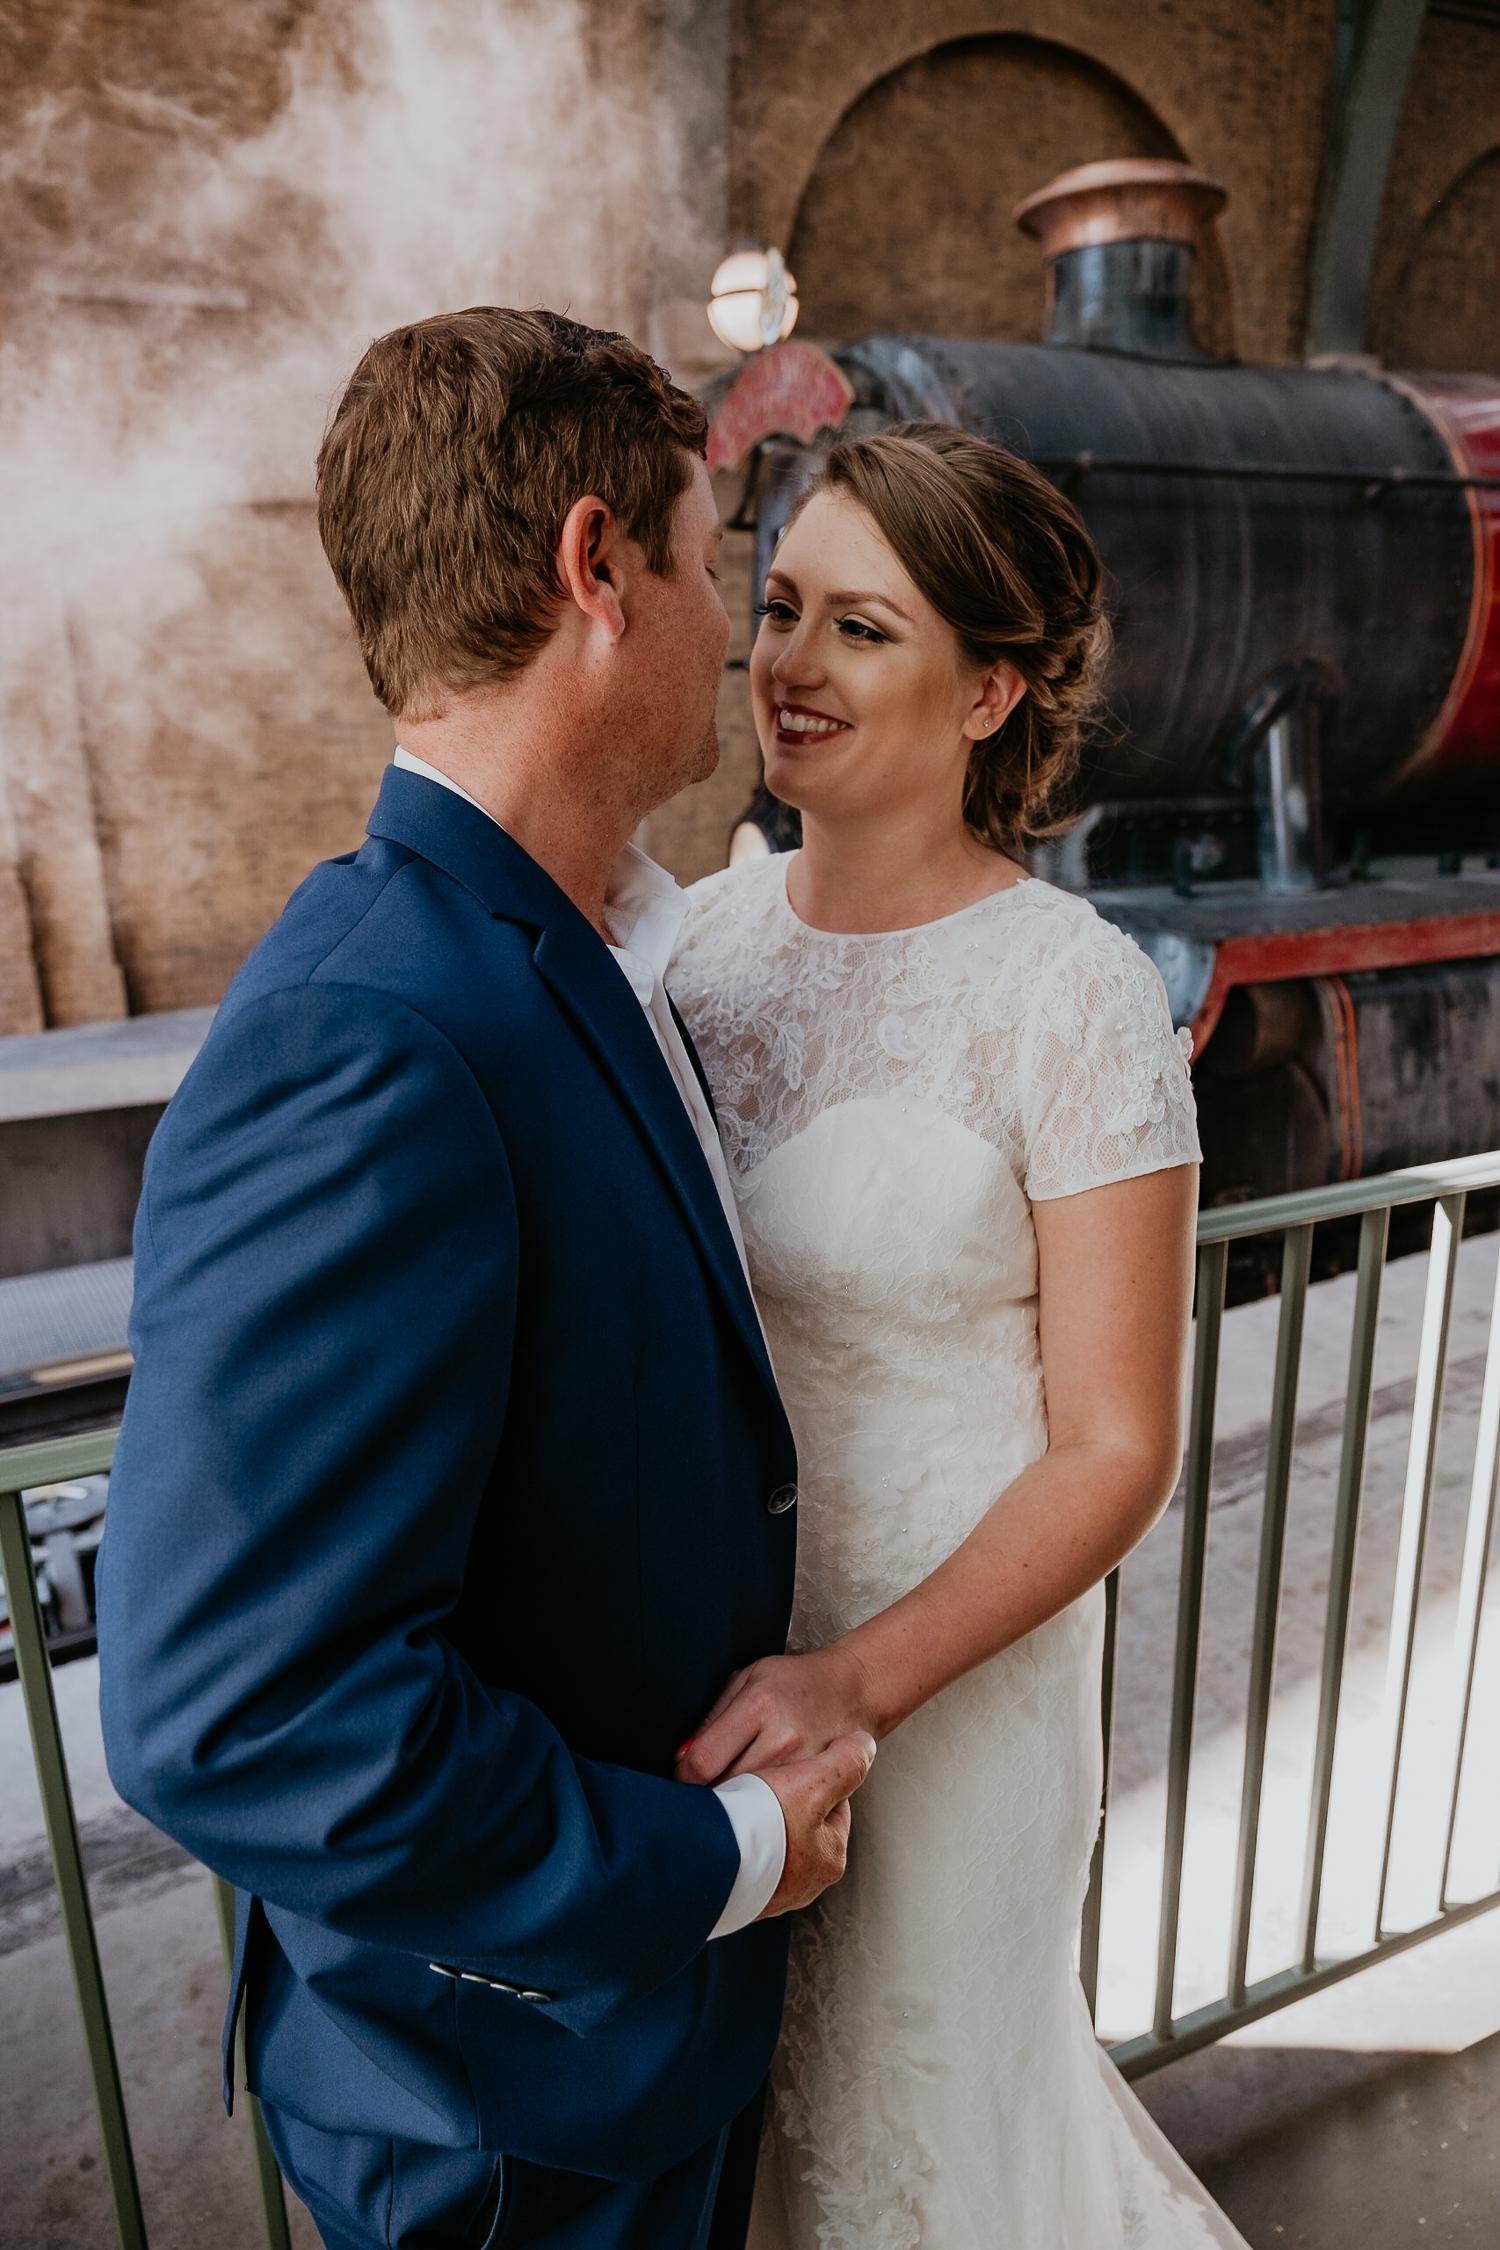 https://www.thirtythreeanda3rd.com/wp-content/uploads/2019/05/352-universal-studio-wedding-chelseamichael.jpg